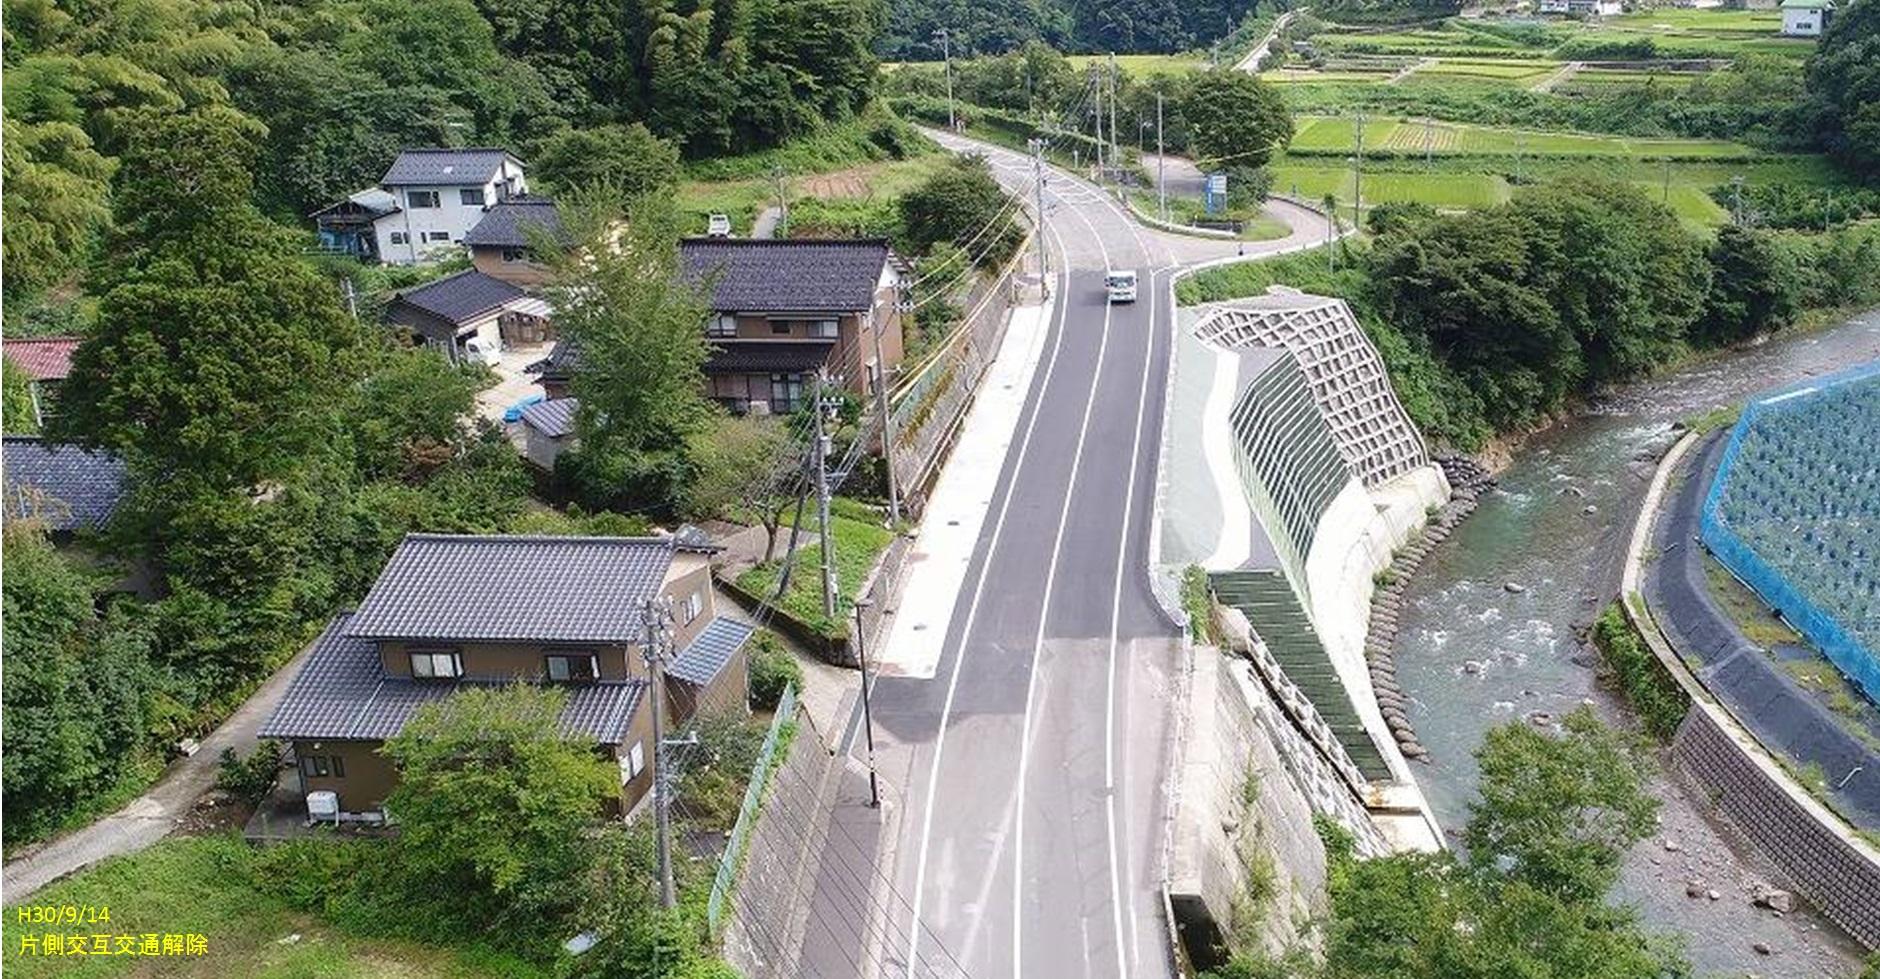 主要地方道 金沢湯涌福光線 災害に強い道路整備工事(設計)業務委託(その2)